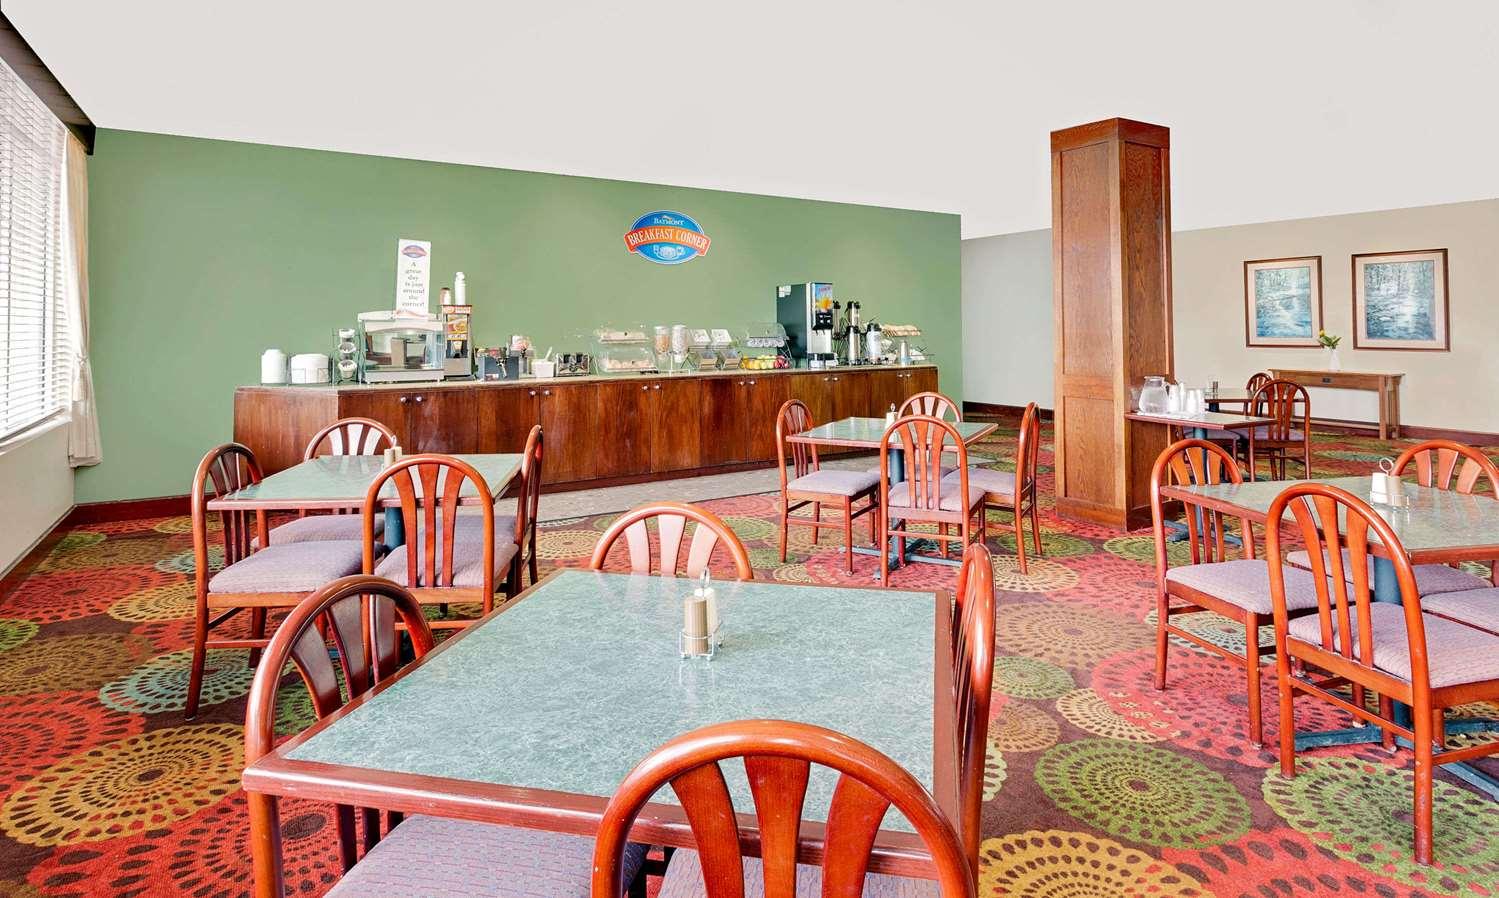 proam - Baymont Inn & Suites Keokuk